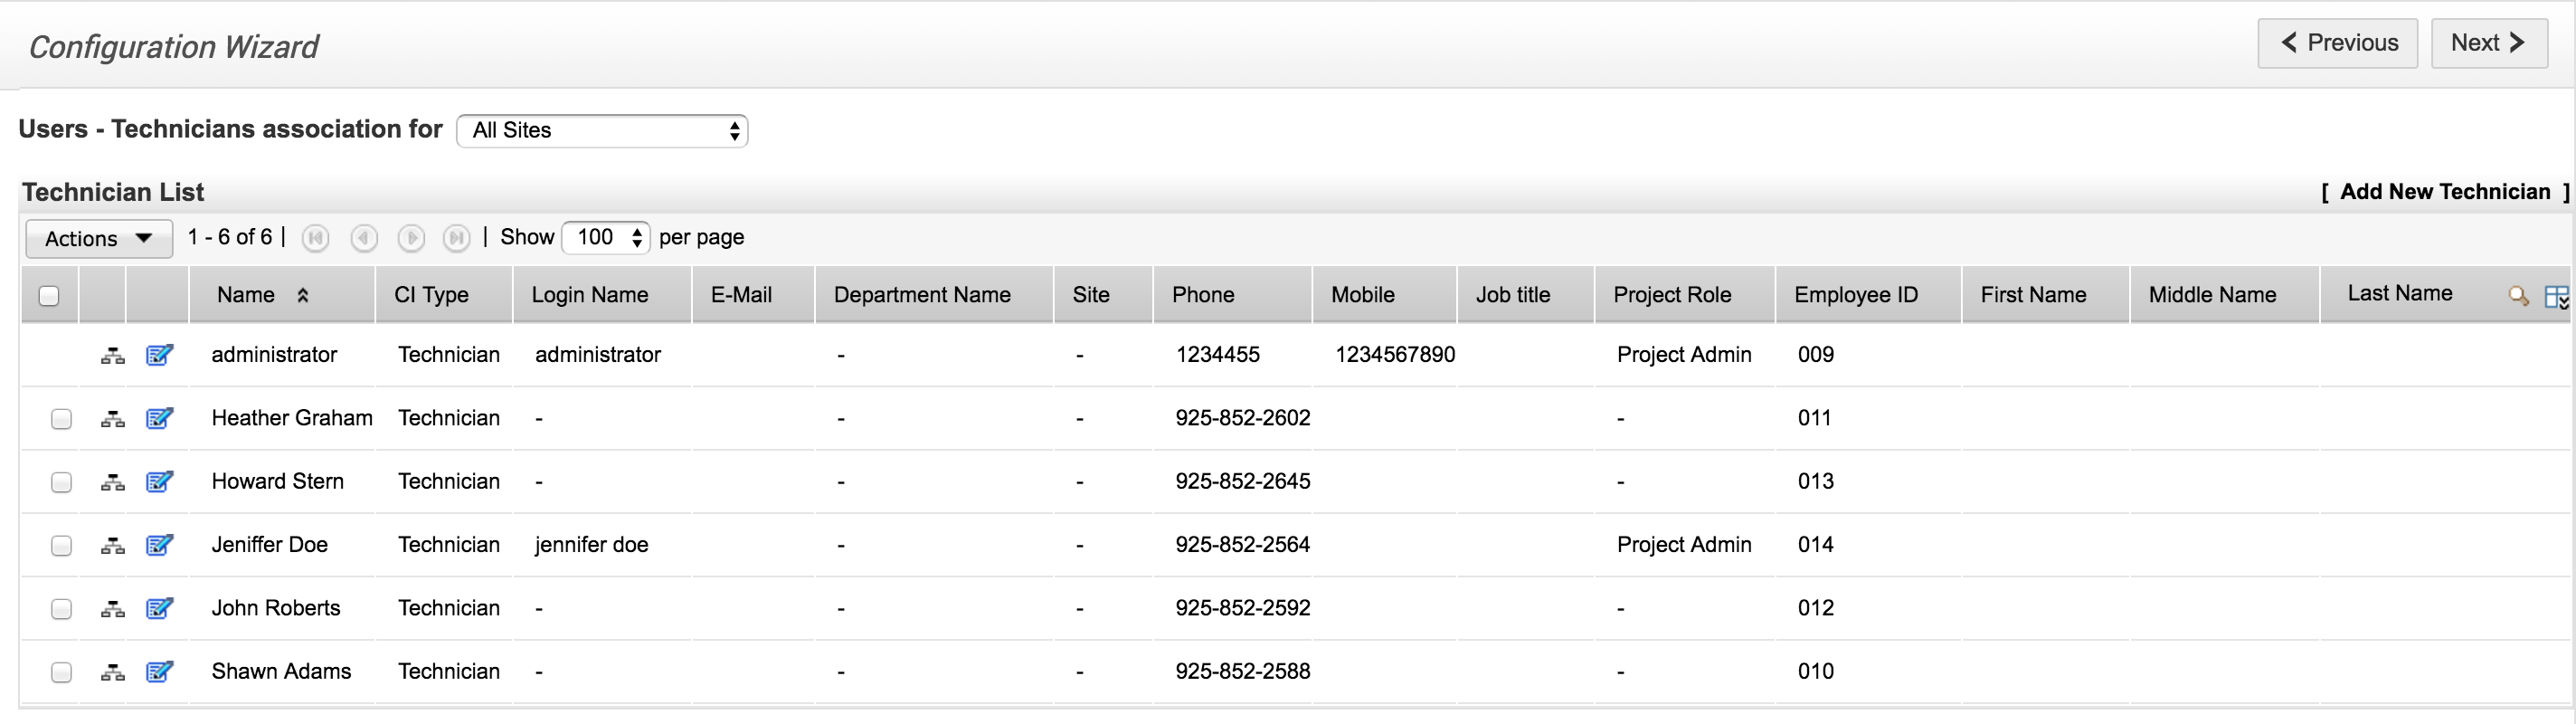 Configure technicians | Help desk customizer - SDP help desk guide